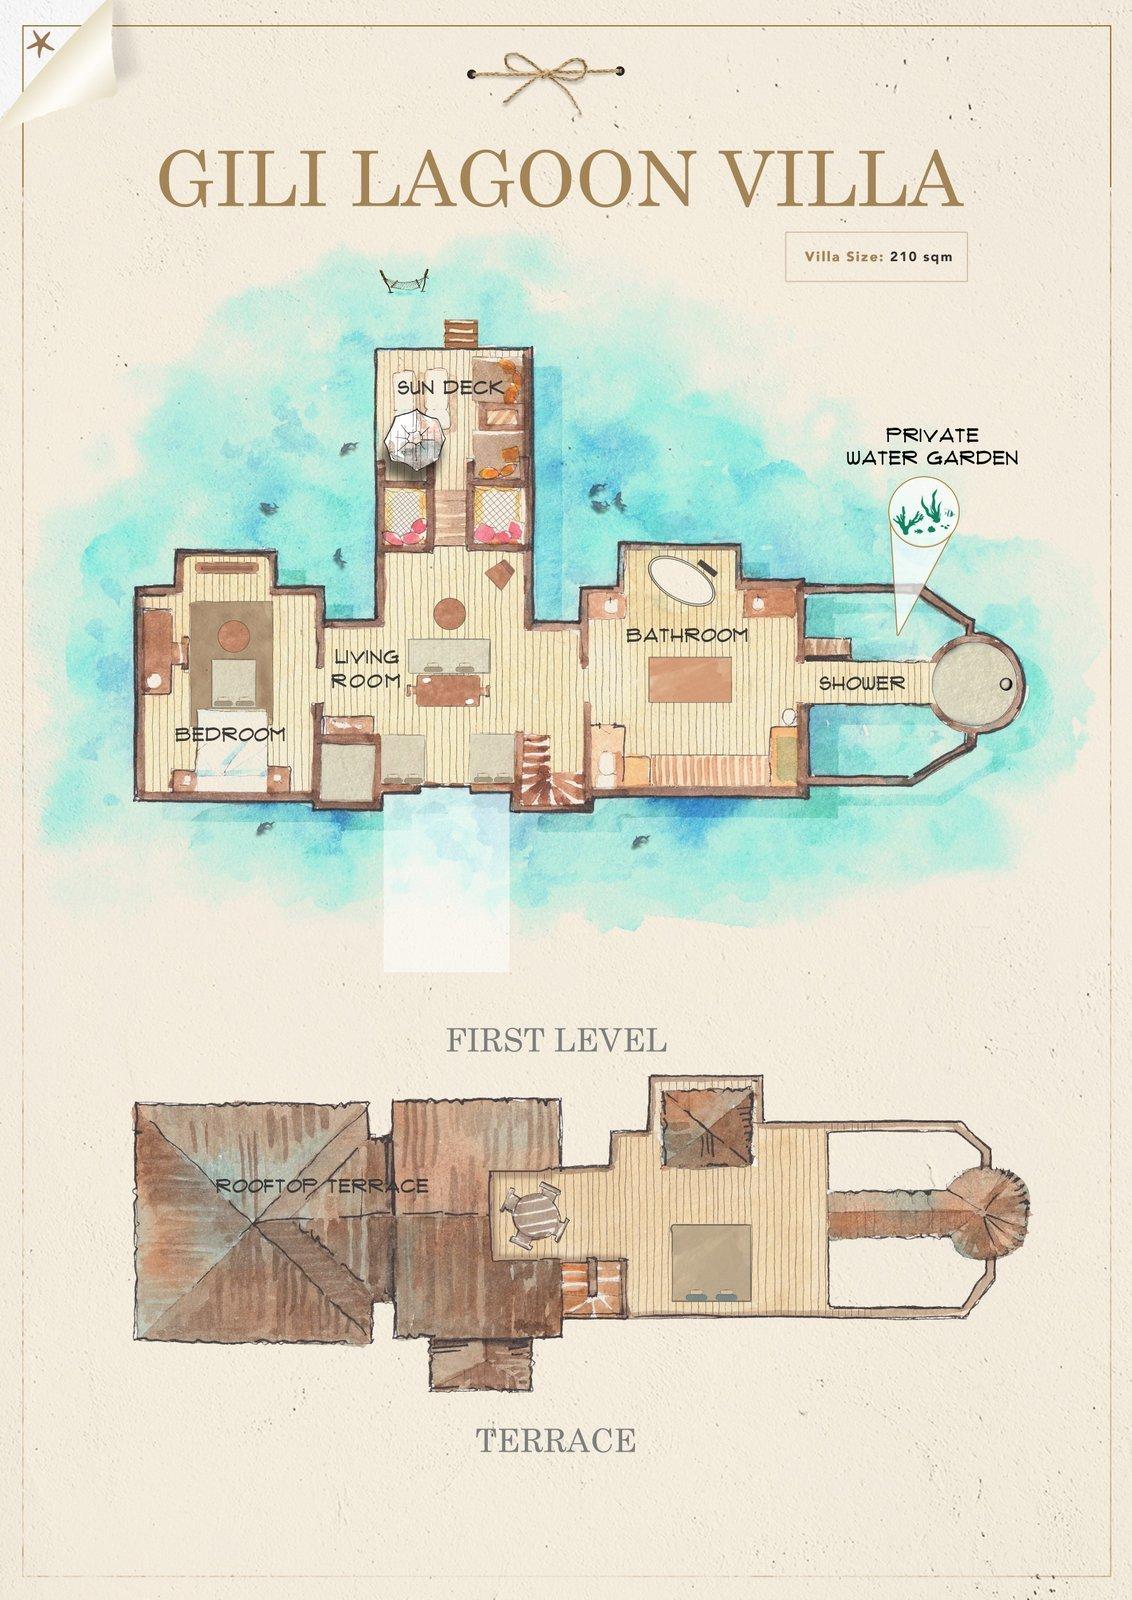 Мальдивы, отель Gili Lankanfushi Maldives, план-схема номера Gili Lagoon Villa